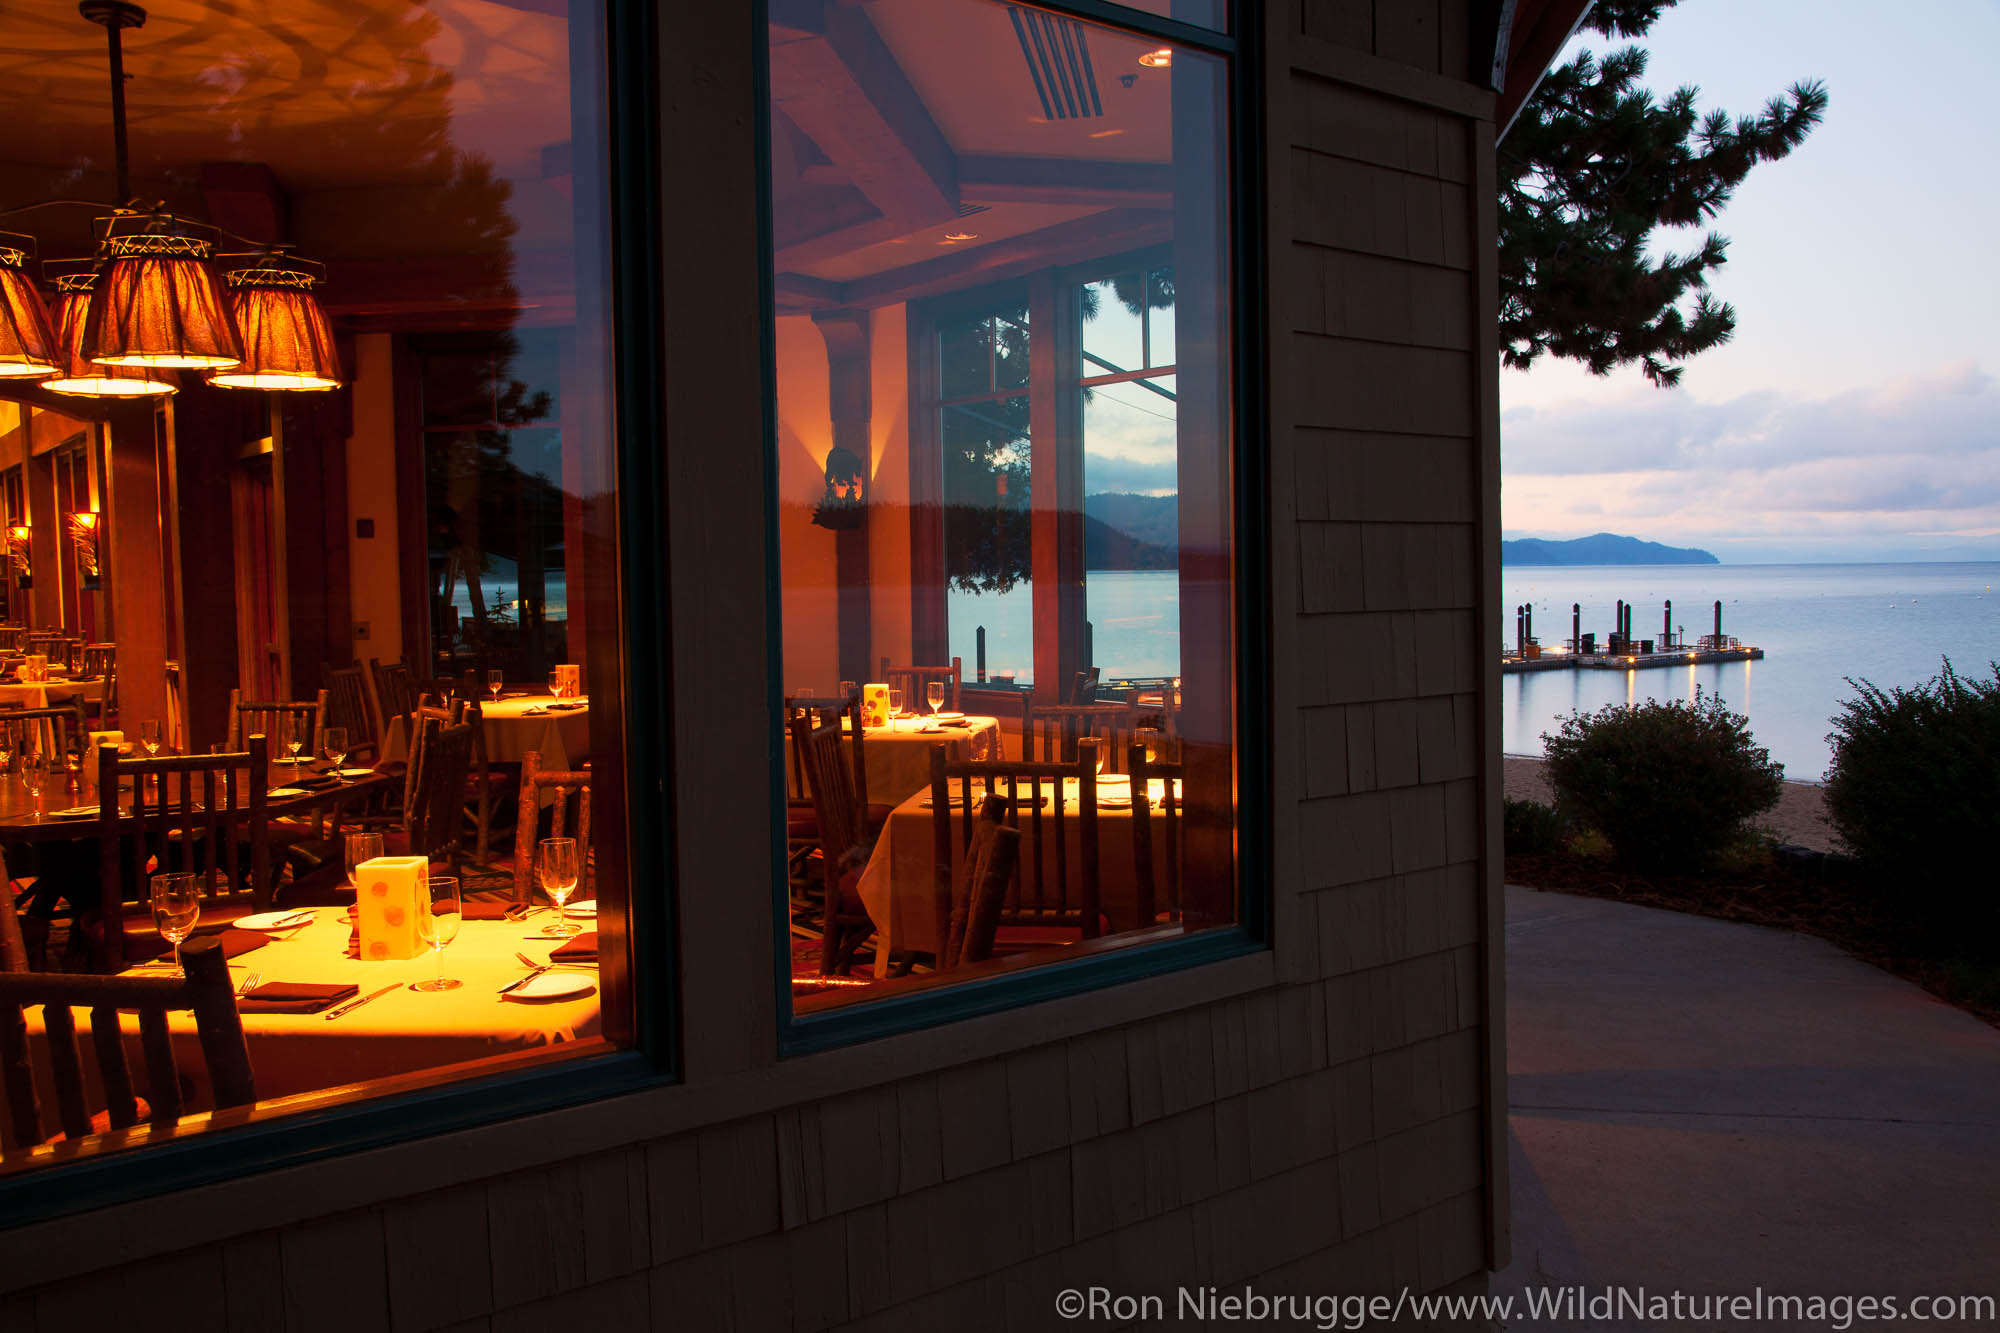 Hyatt Regency Lake Tahoe, Incline Village, NV